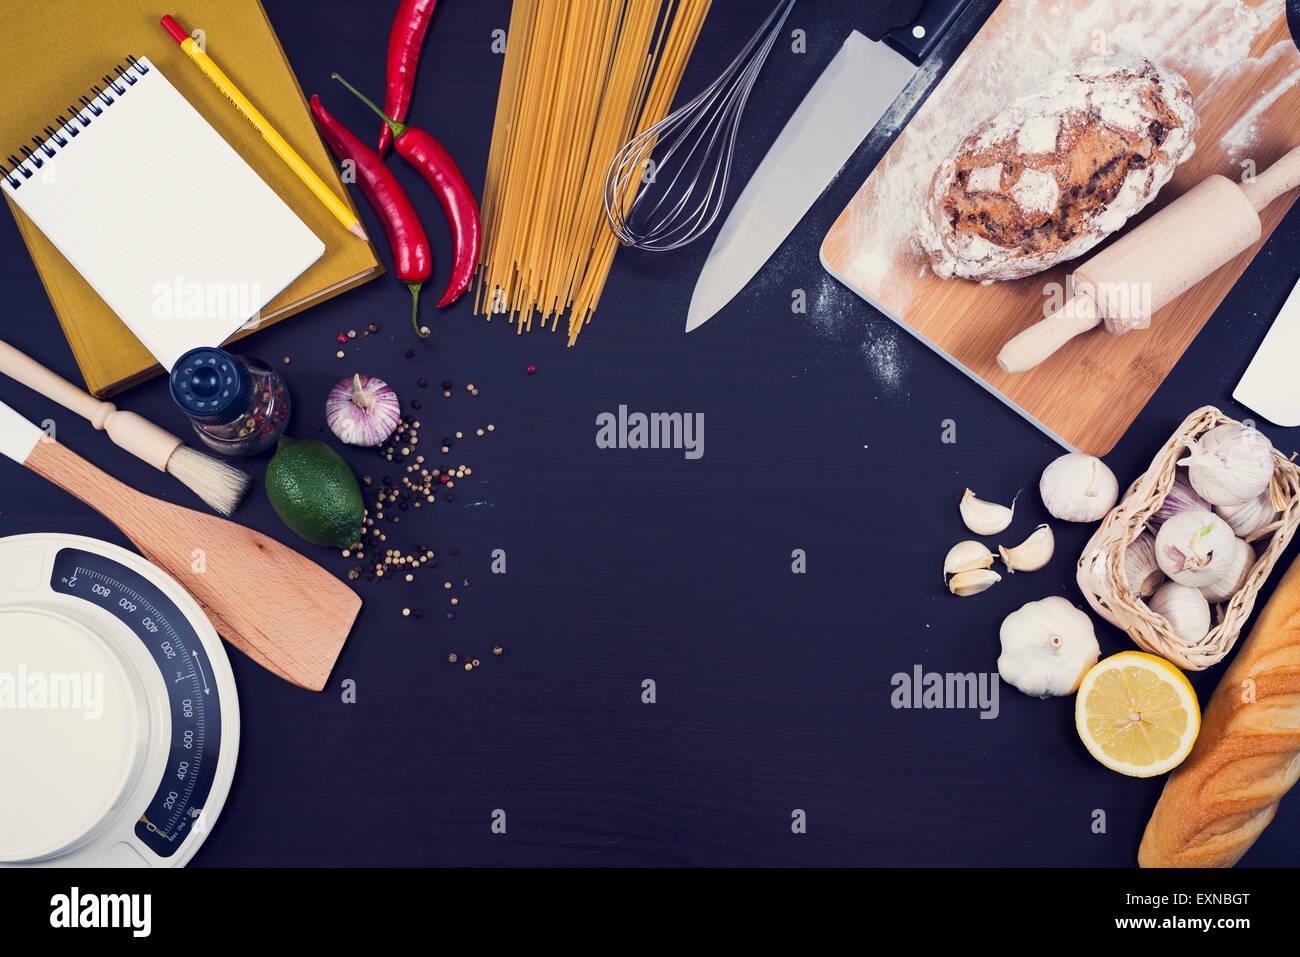 Food Hero header for kitchen or restaurant. - Stock Image